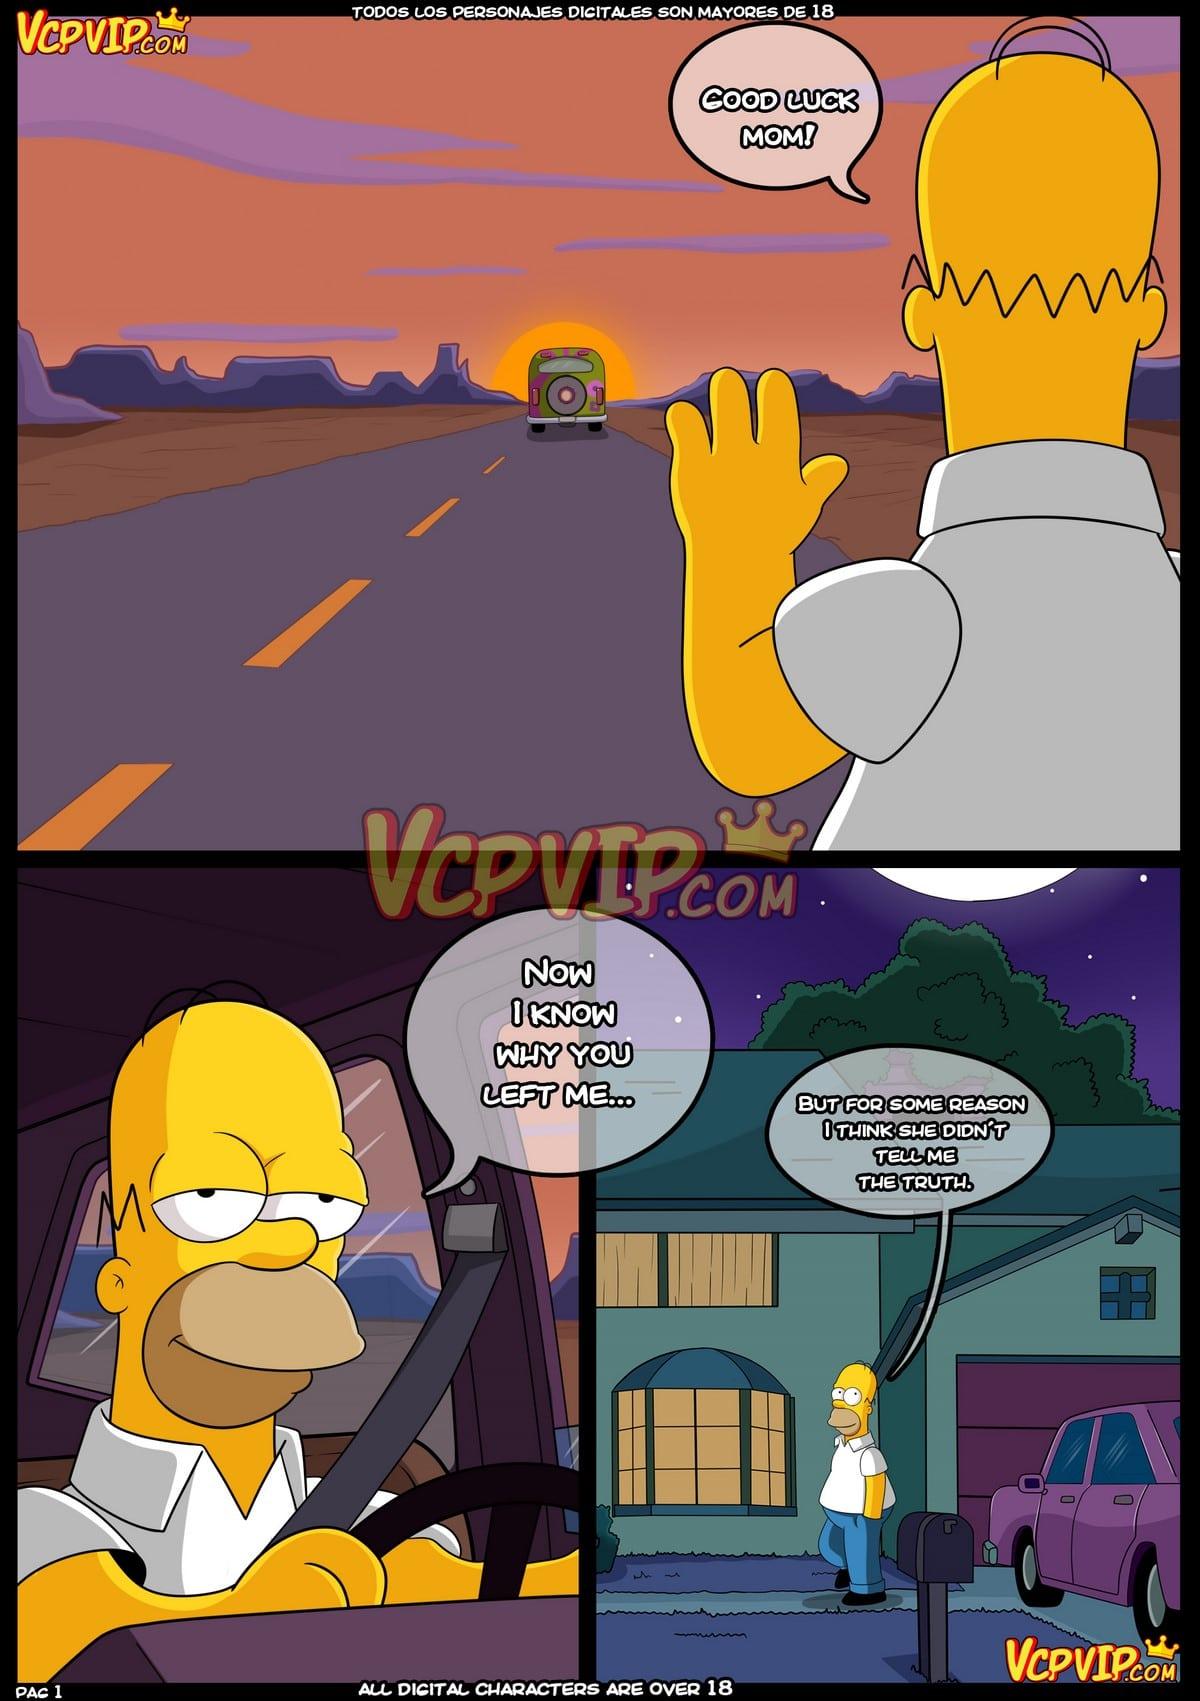 (English) Simpsons: Mum (Original VCP) - 1